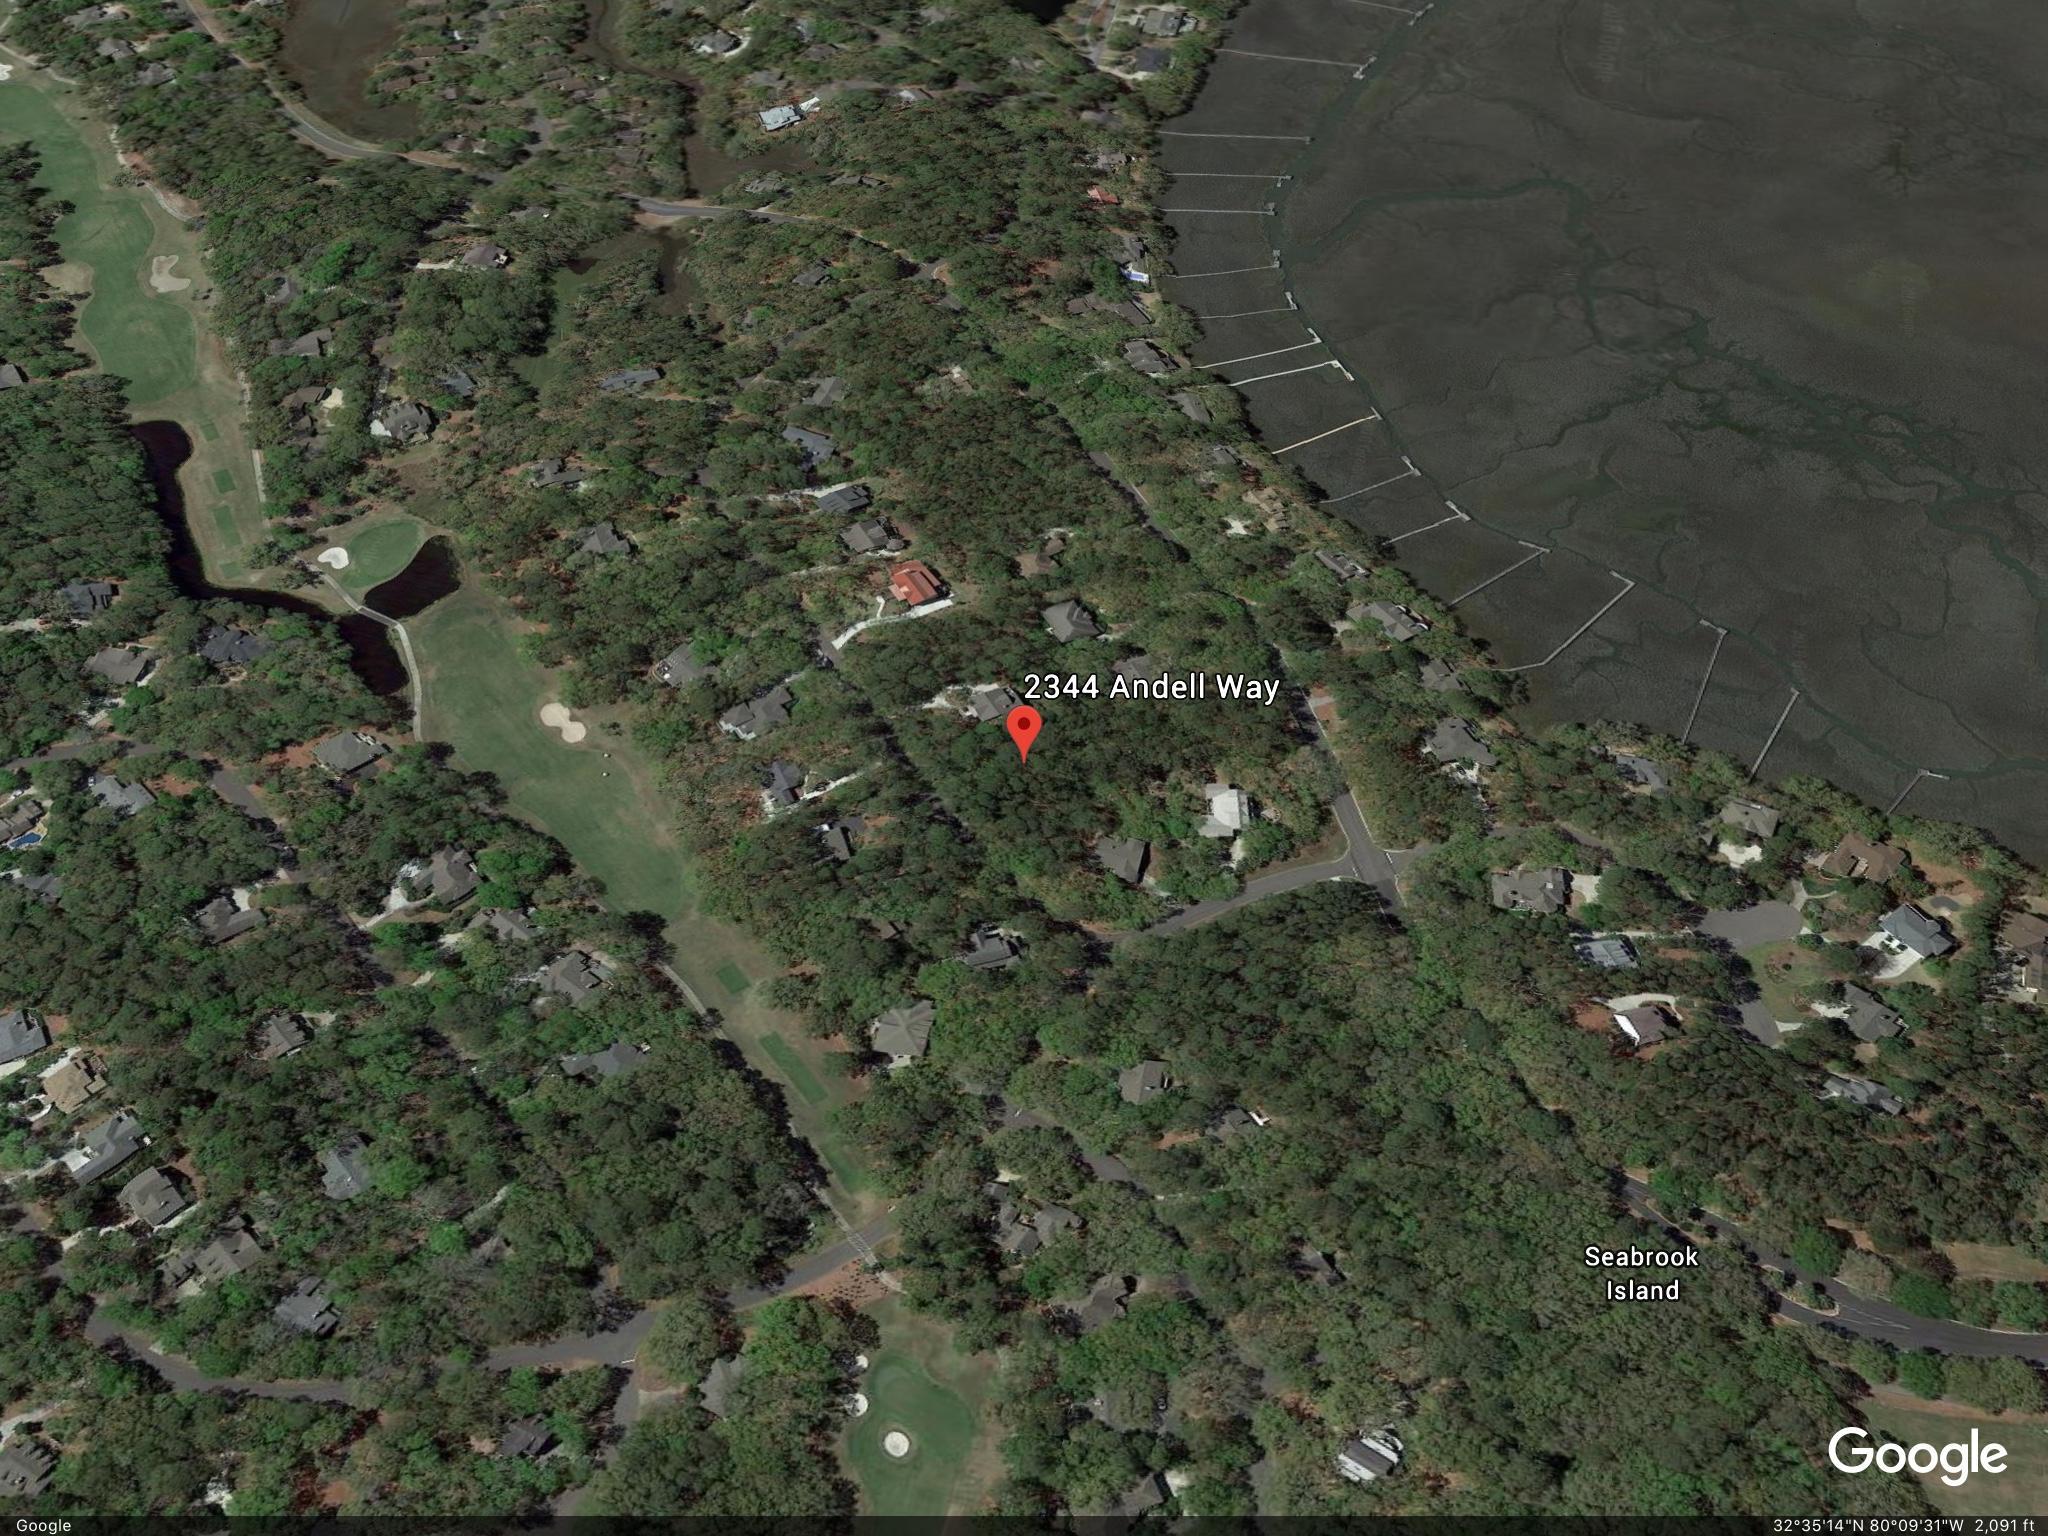 2344 Andell Way, Seabrook Island, SC 29455